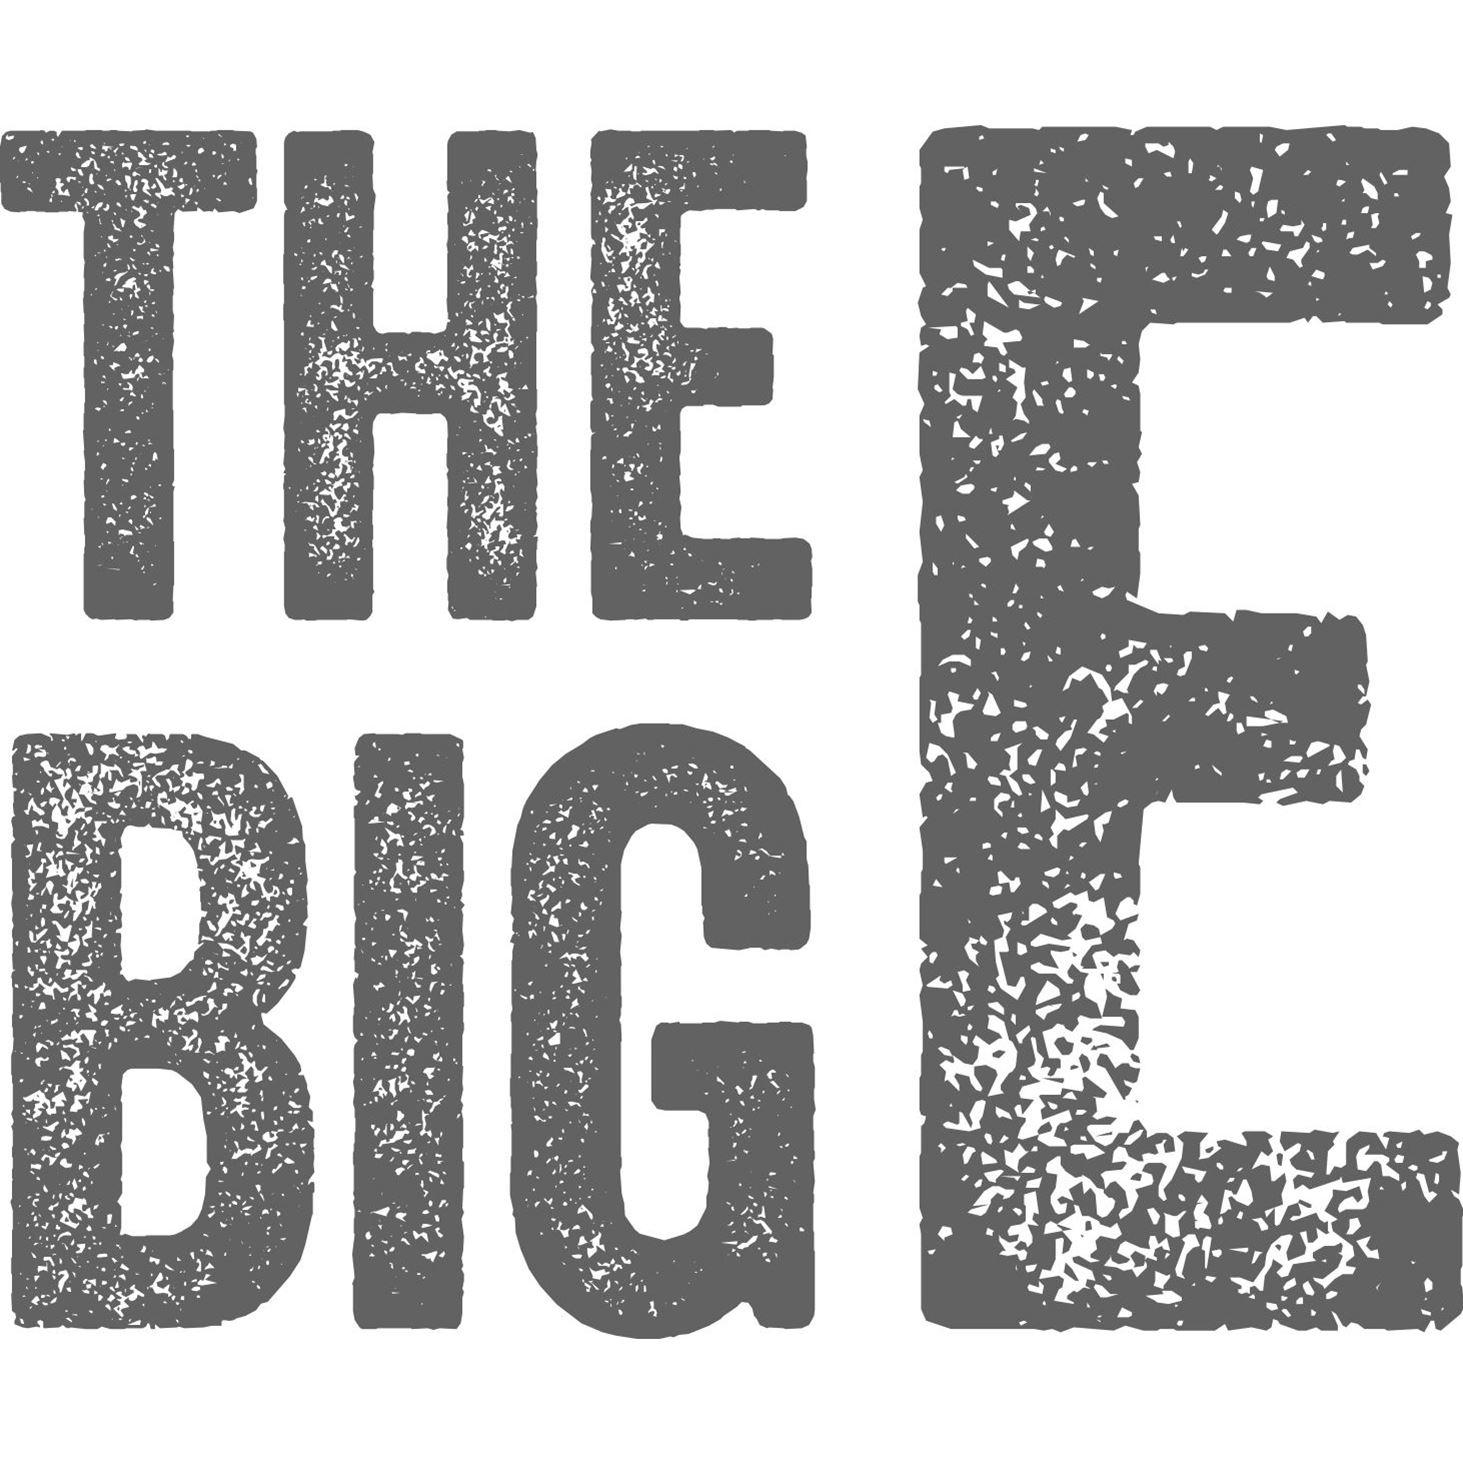 www.thebige.com